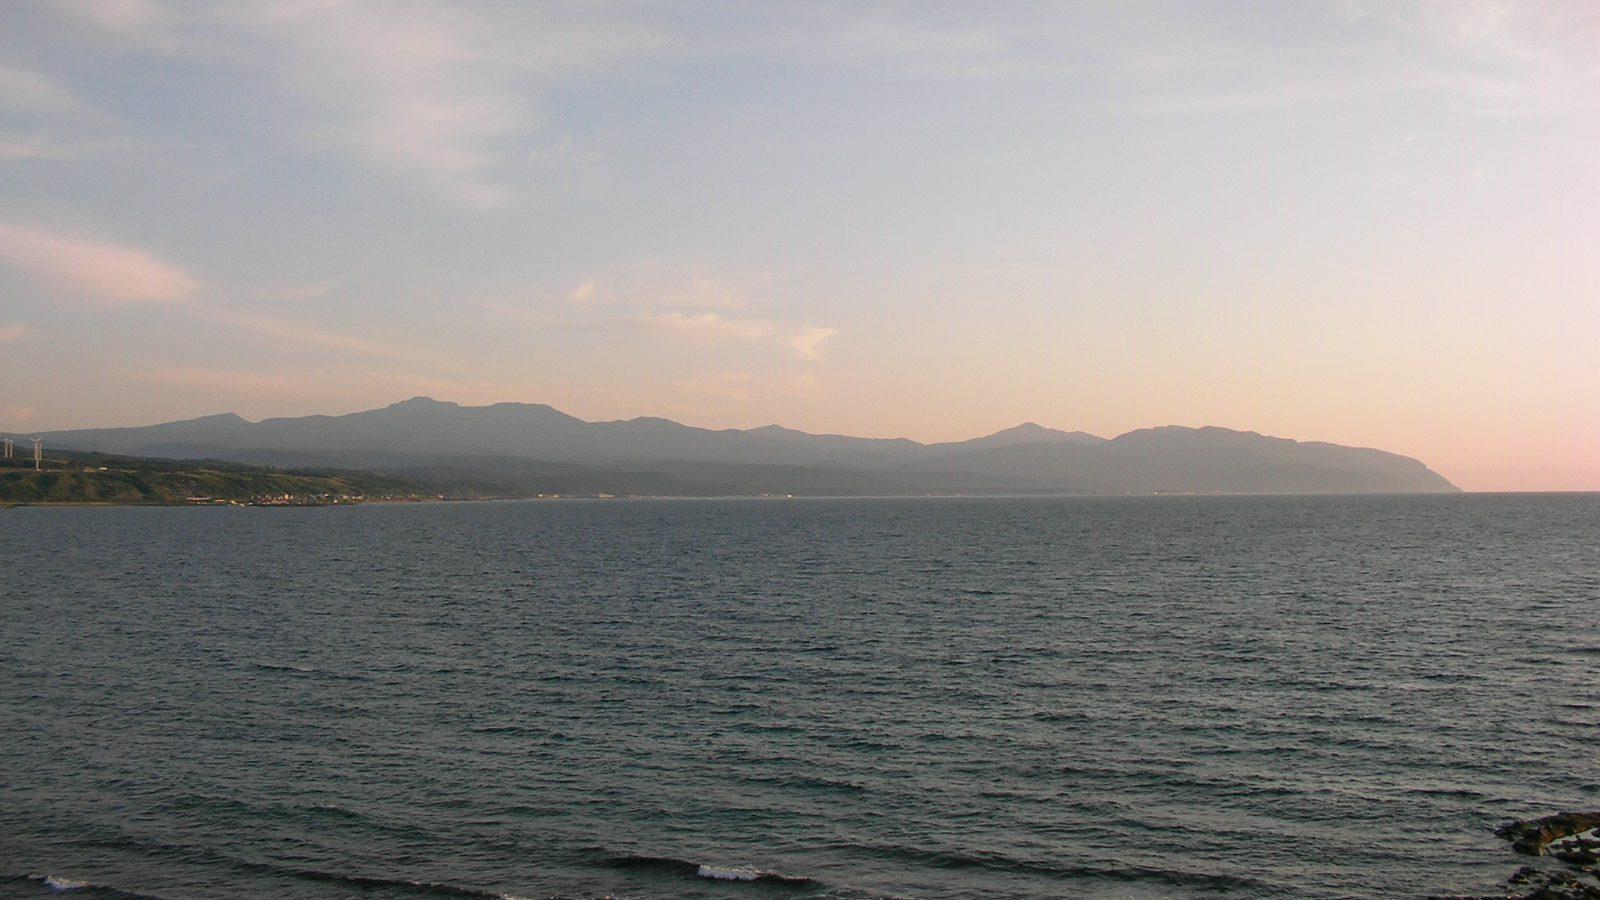 Rumoi 'Golden' Beach and Cape